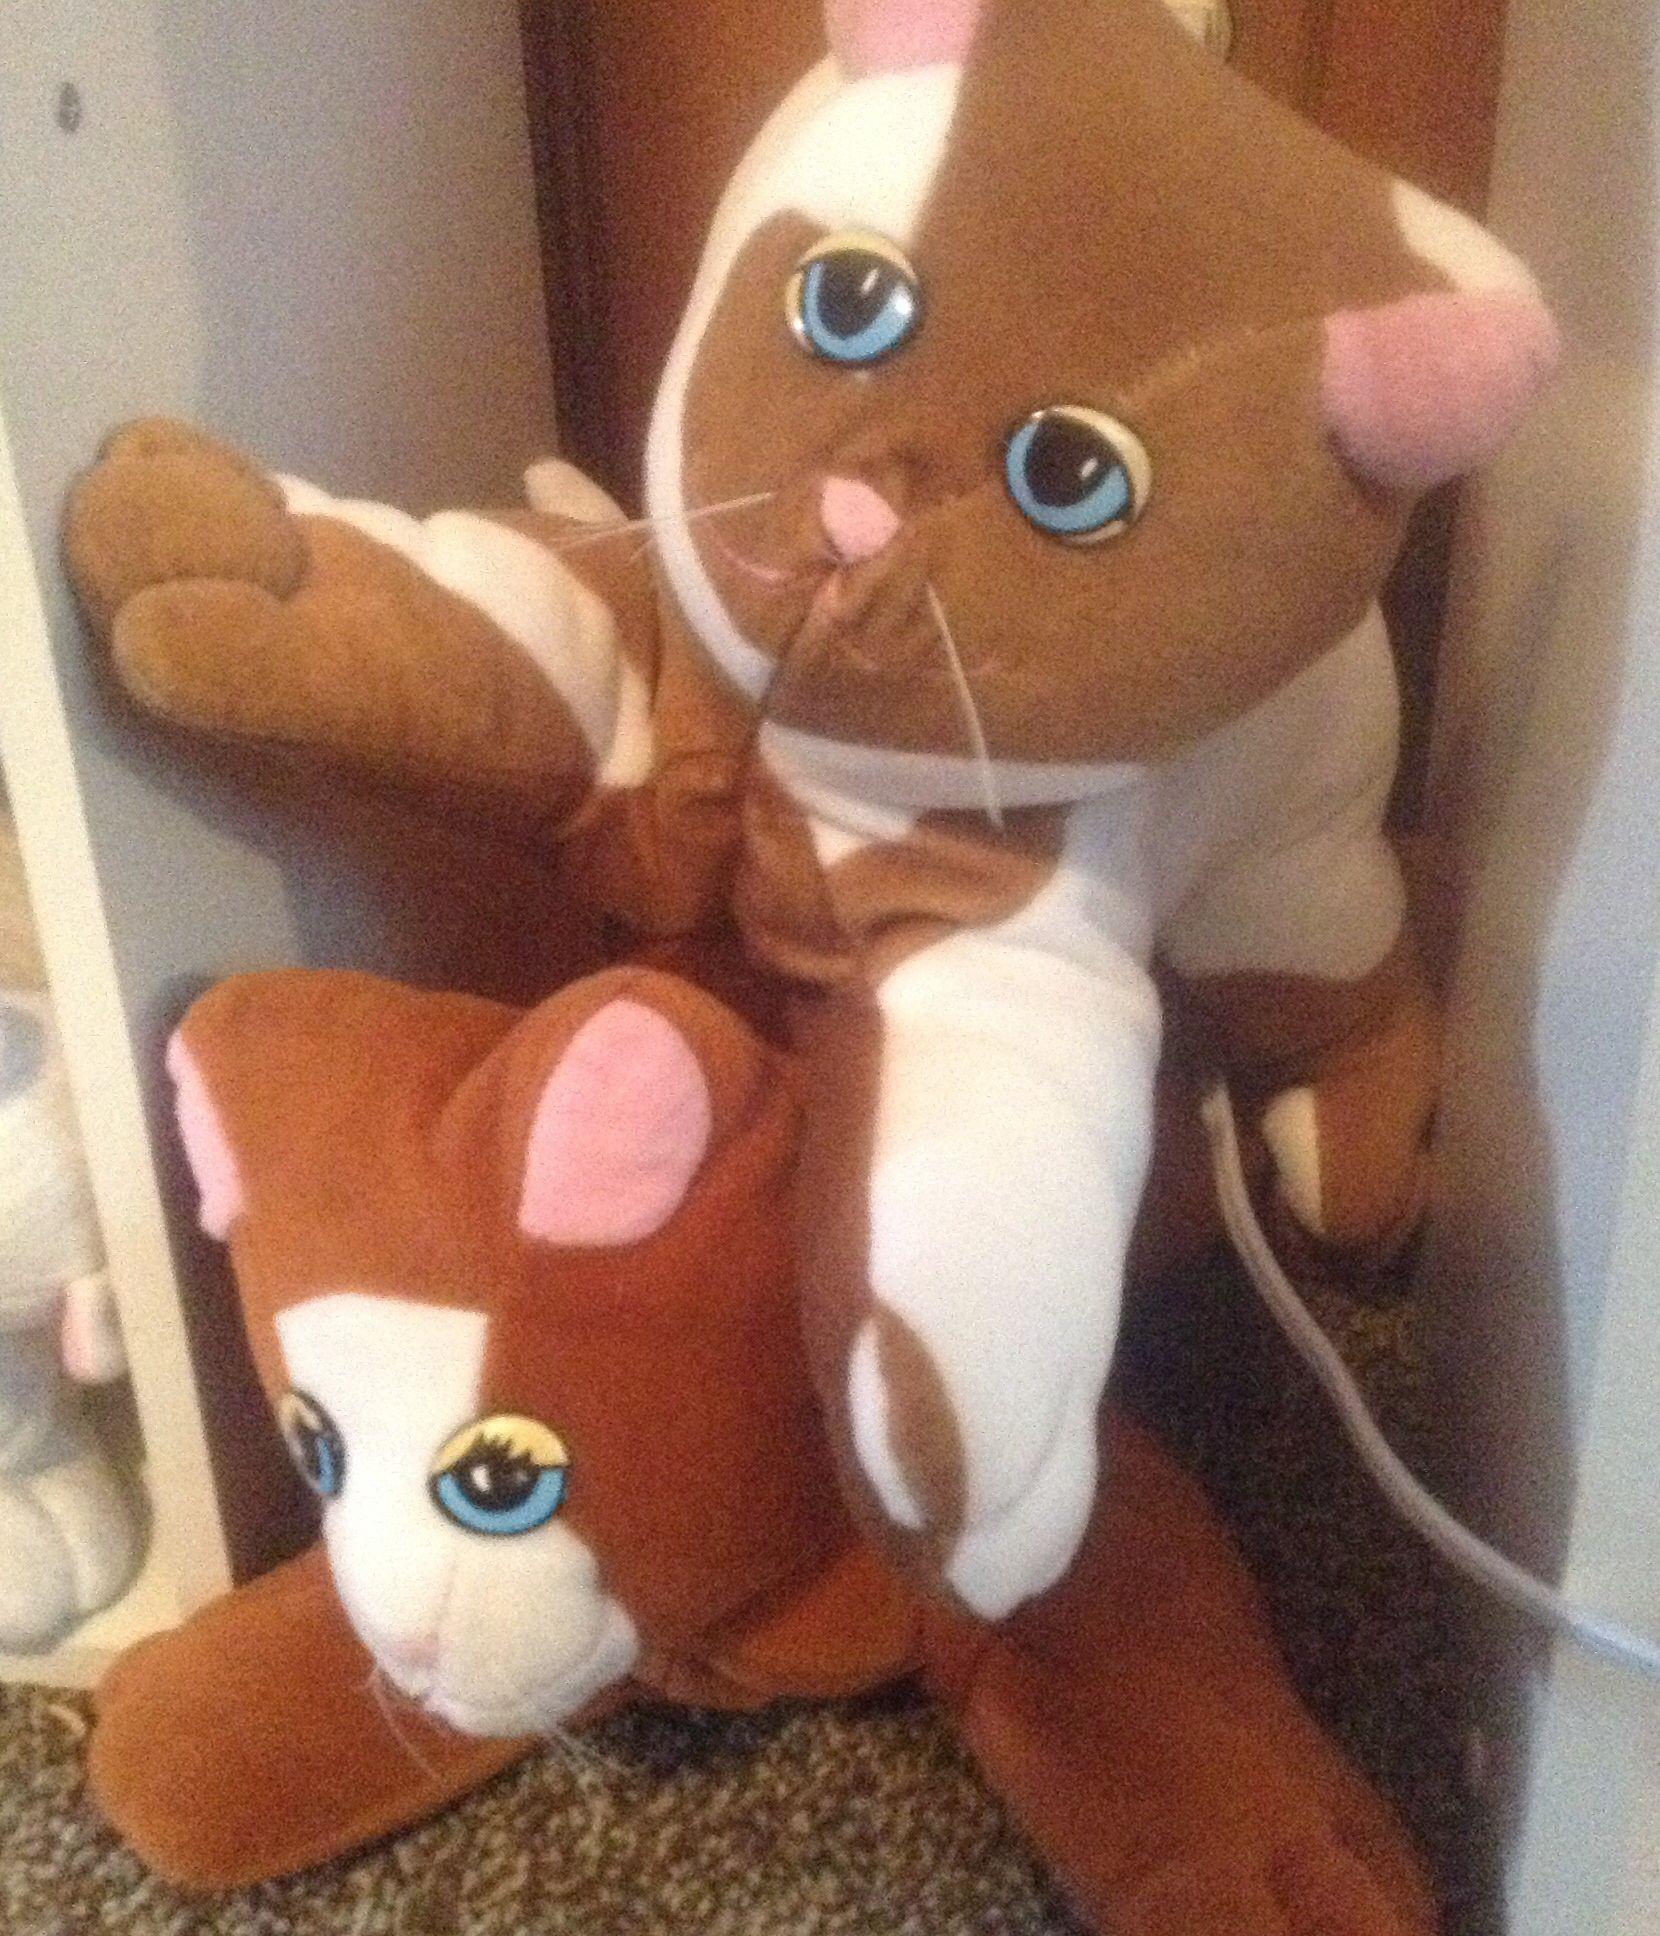 Pound Pur… Pound puppies, Dinosaur stuffed animal, Kittens